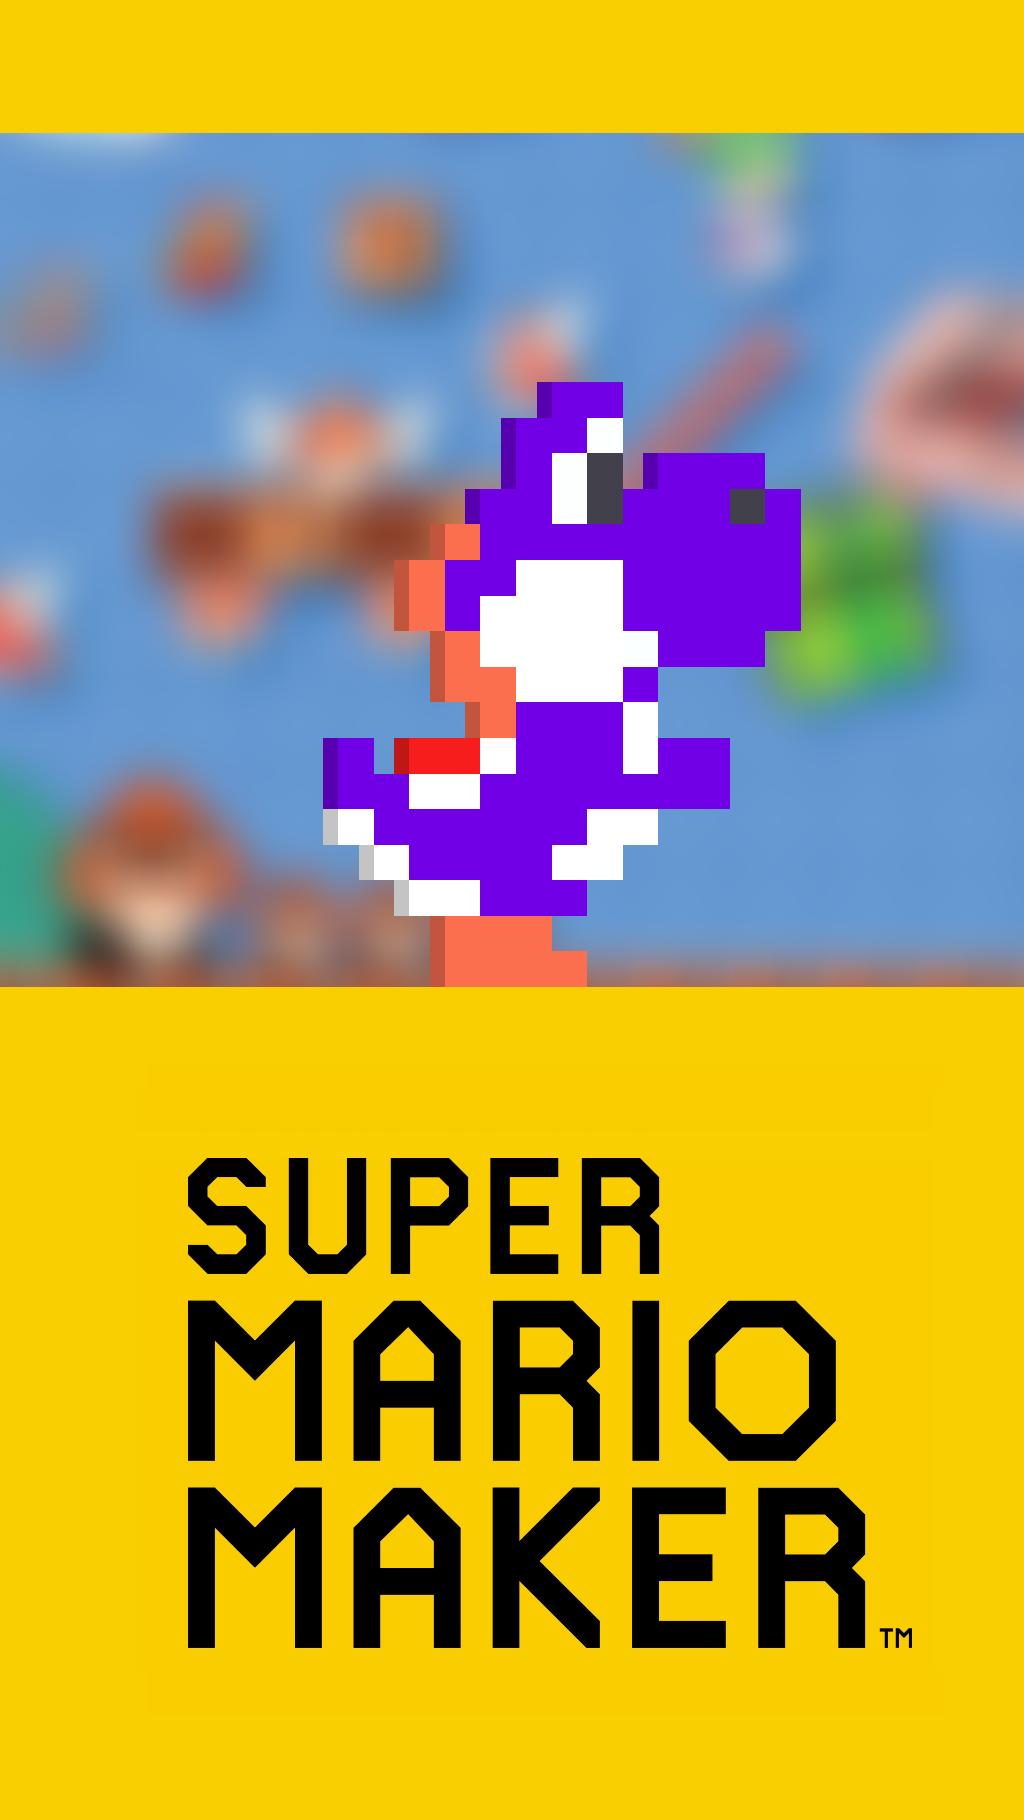 Purple Yoshi - Super Mario Maker Wallpaper (Phone) by TheWolfGalaxy